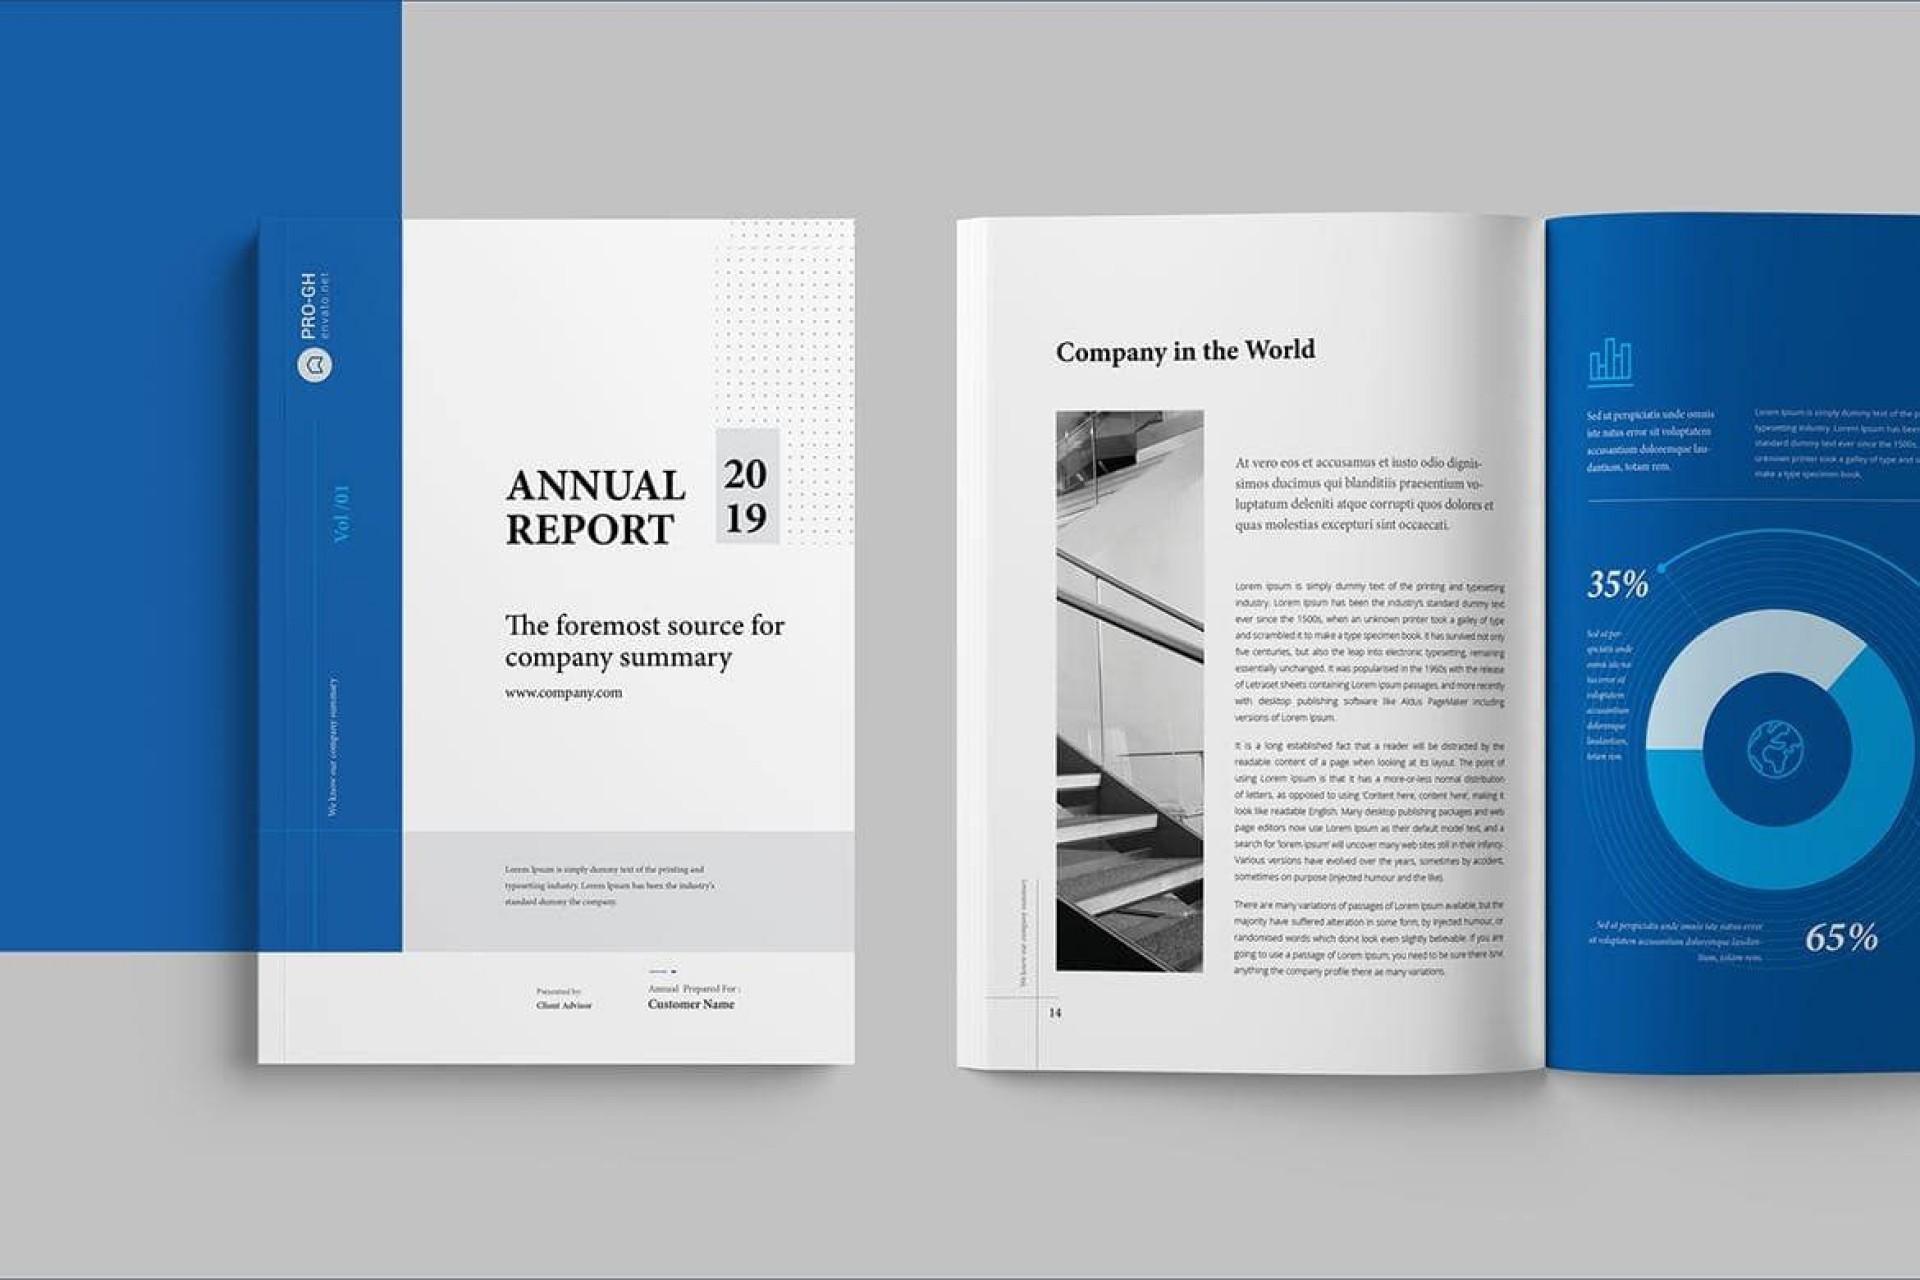 010 Magnificent Free Annual Report Template Indesign Design  Adobe Non Profit1920